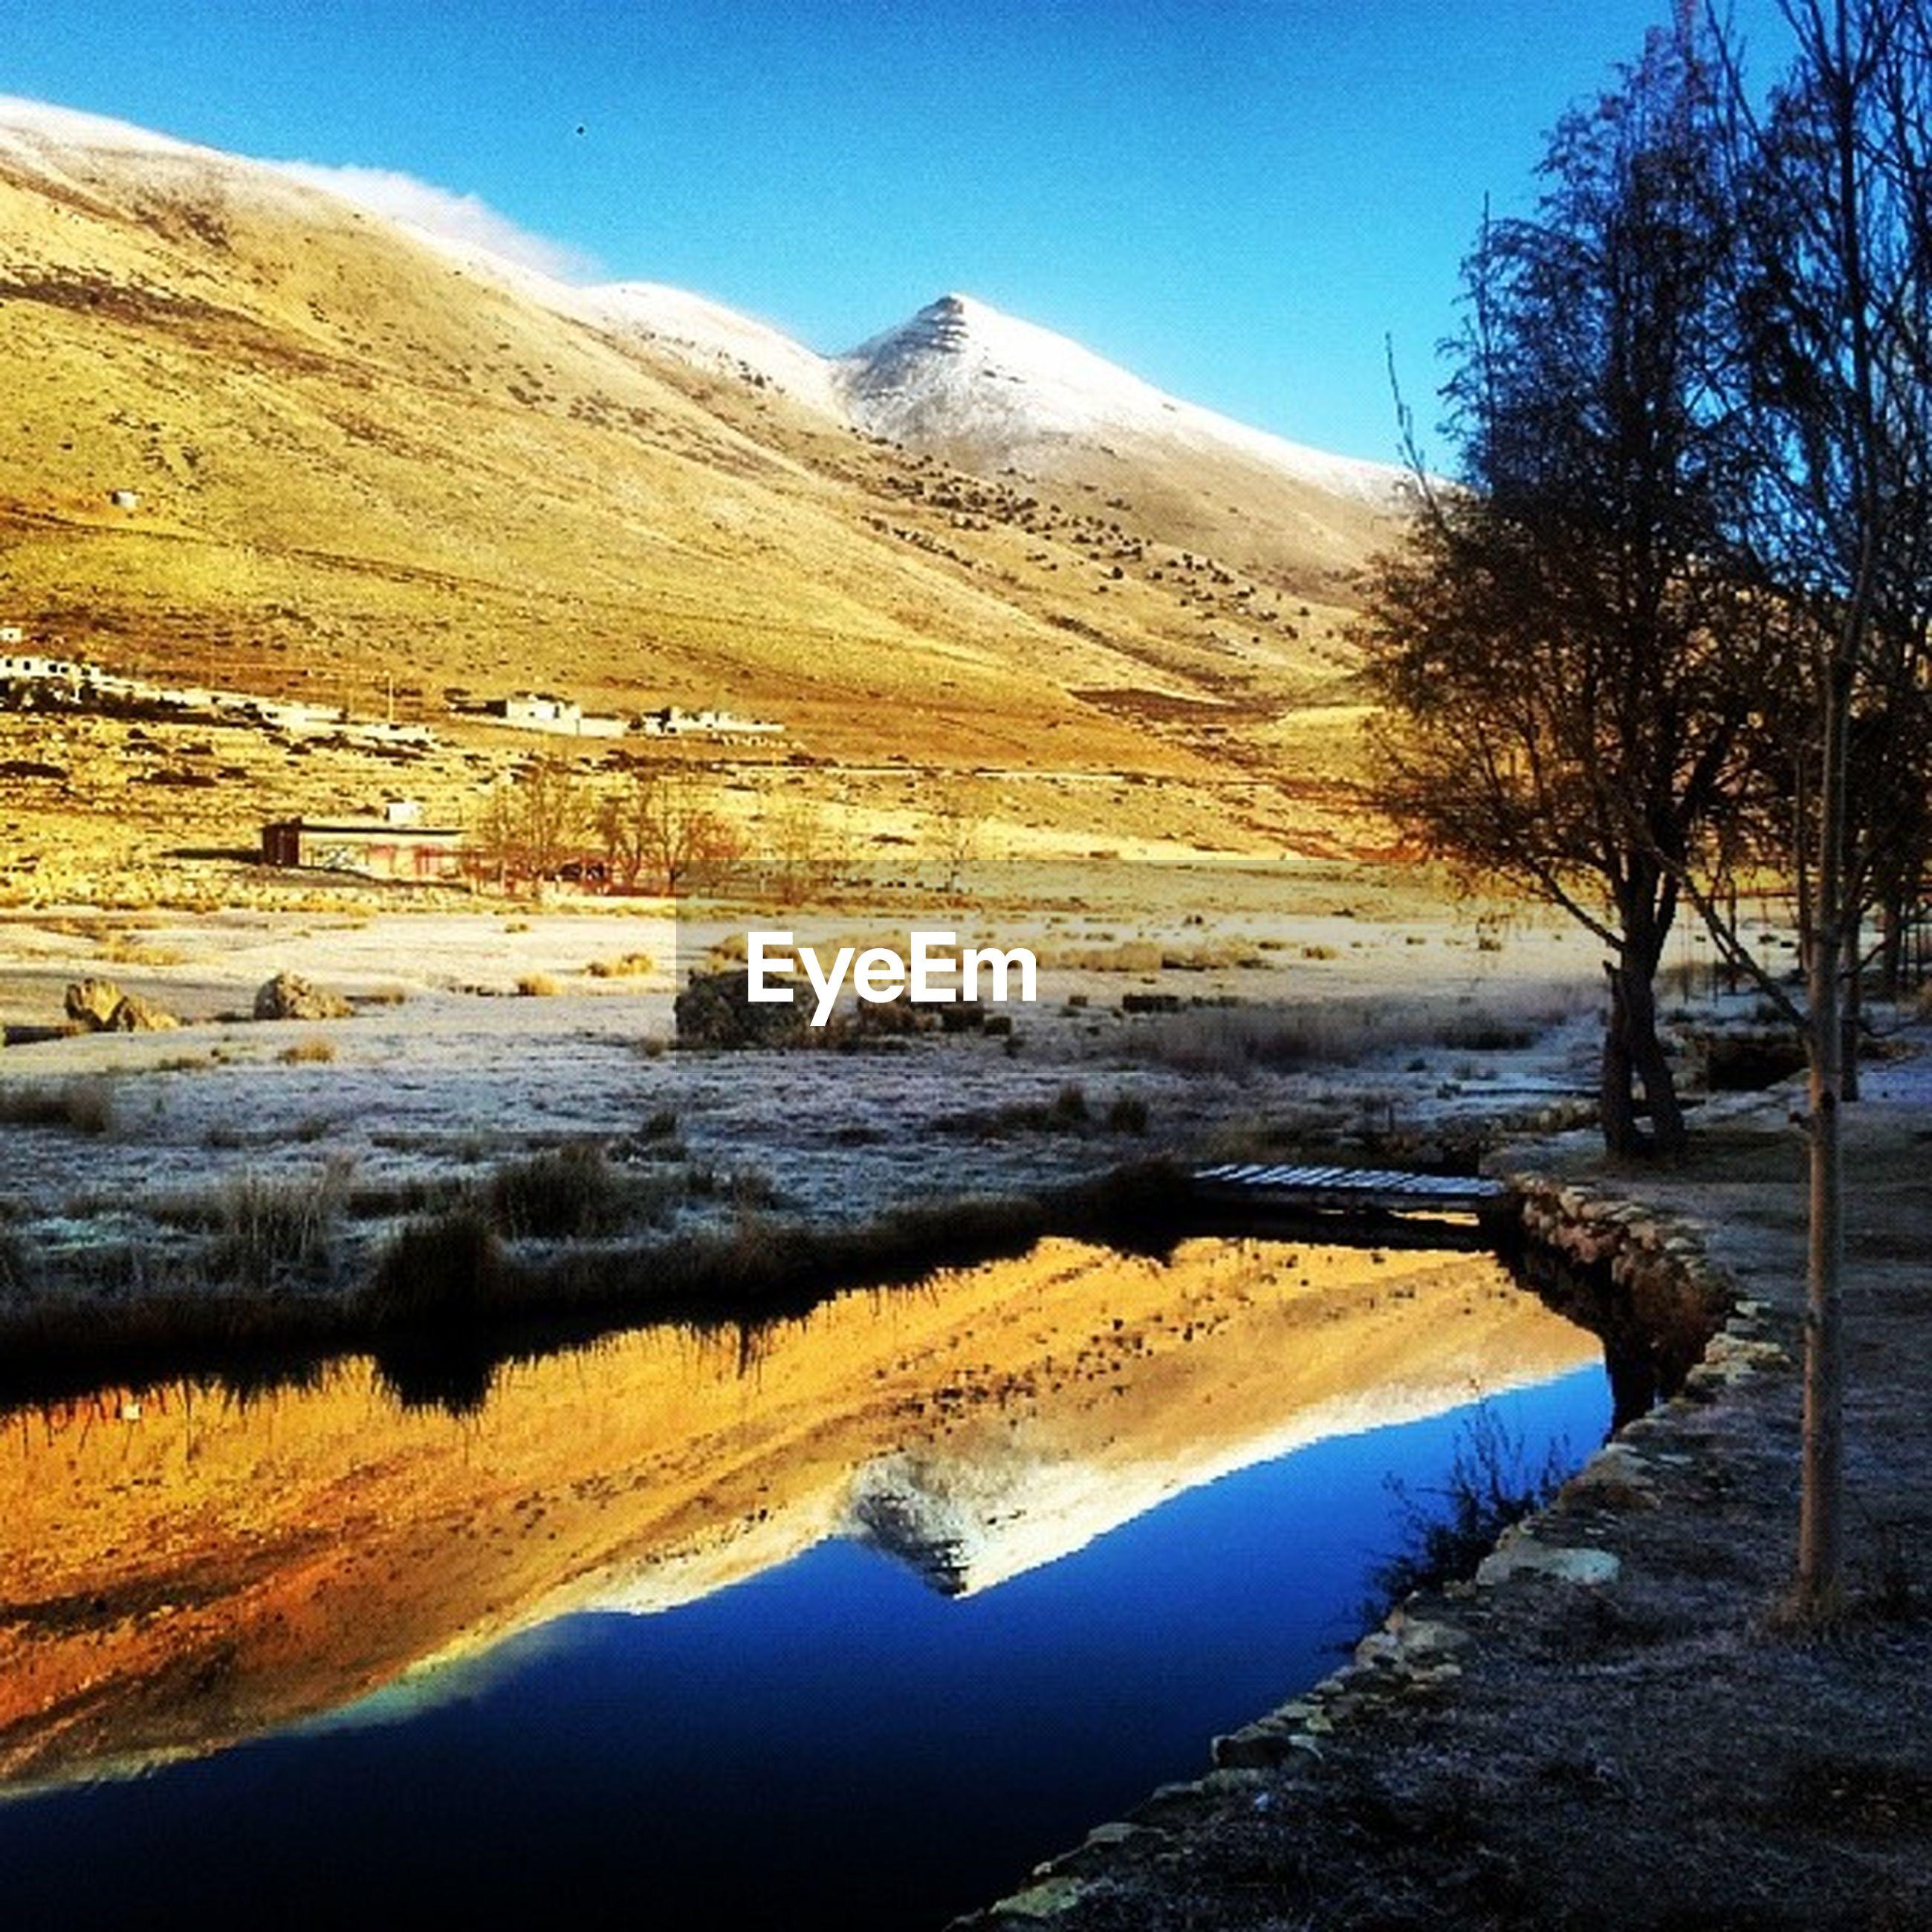 mountain, water, tranquil scene, tranquility, scenics, beauty in nature, blue, lake, clear sky, landscape, mountain range, nature, tree, reflection, river, non-urban scene, idyllic, sky, bare tree, sunlight